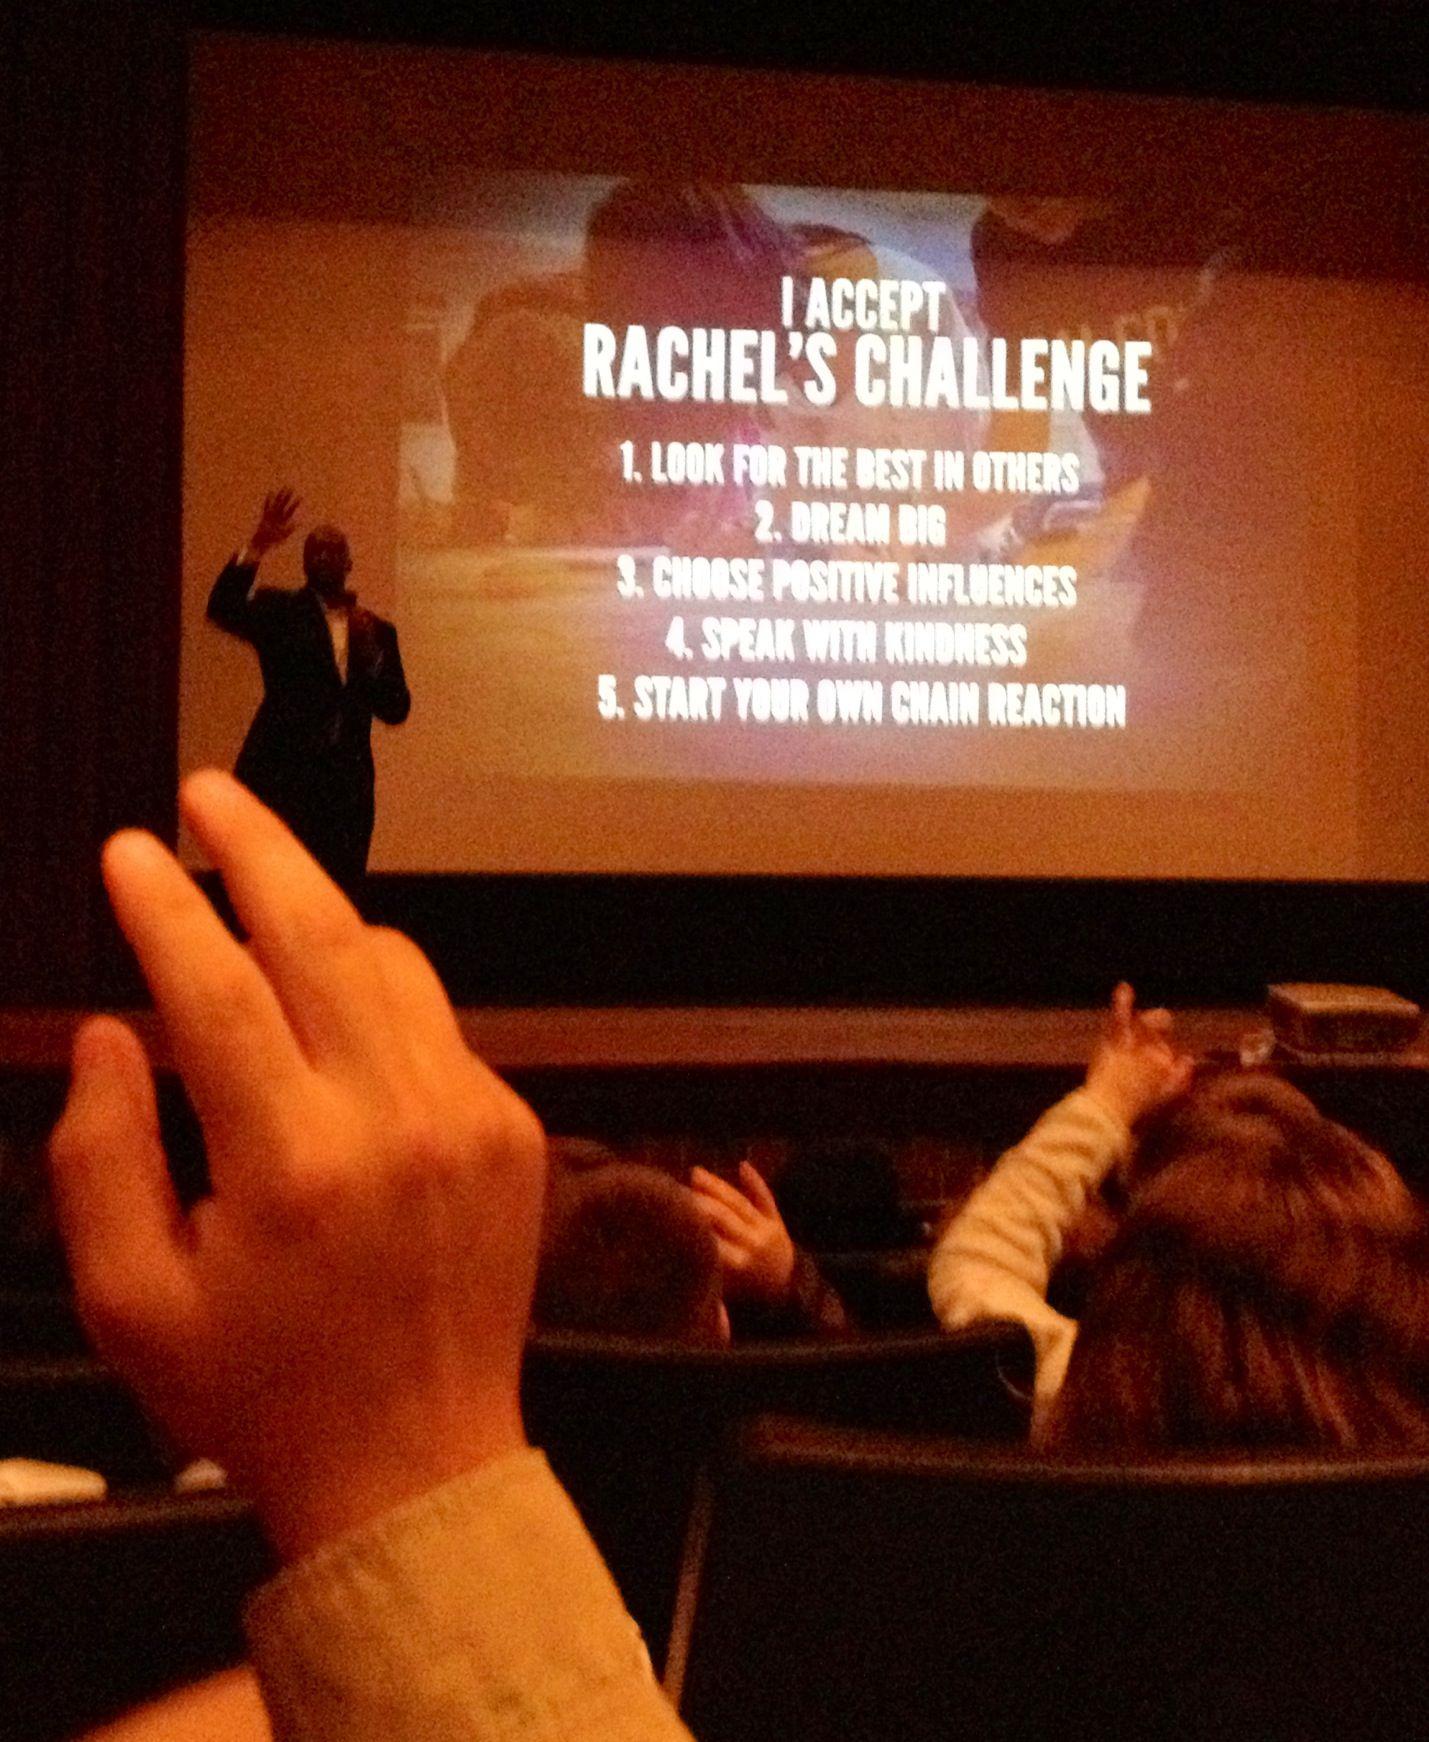 Rachel S Challenge 1 Look For The Best In Others 2